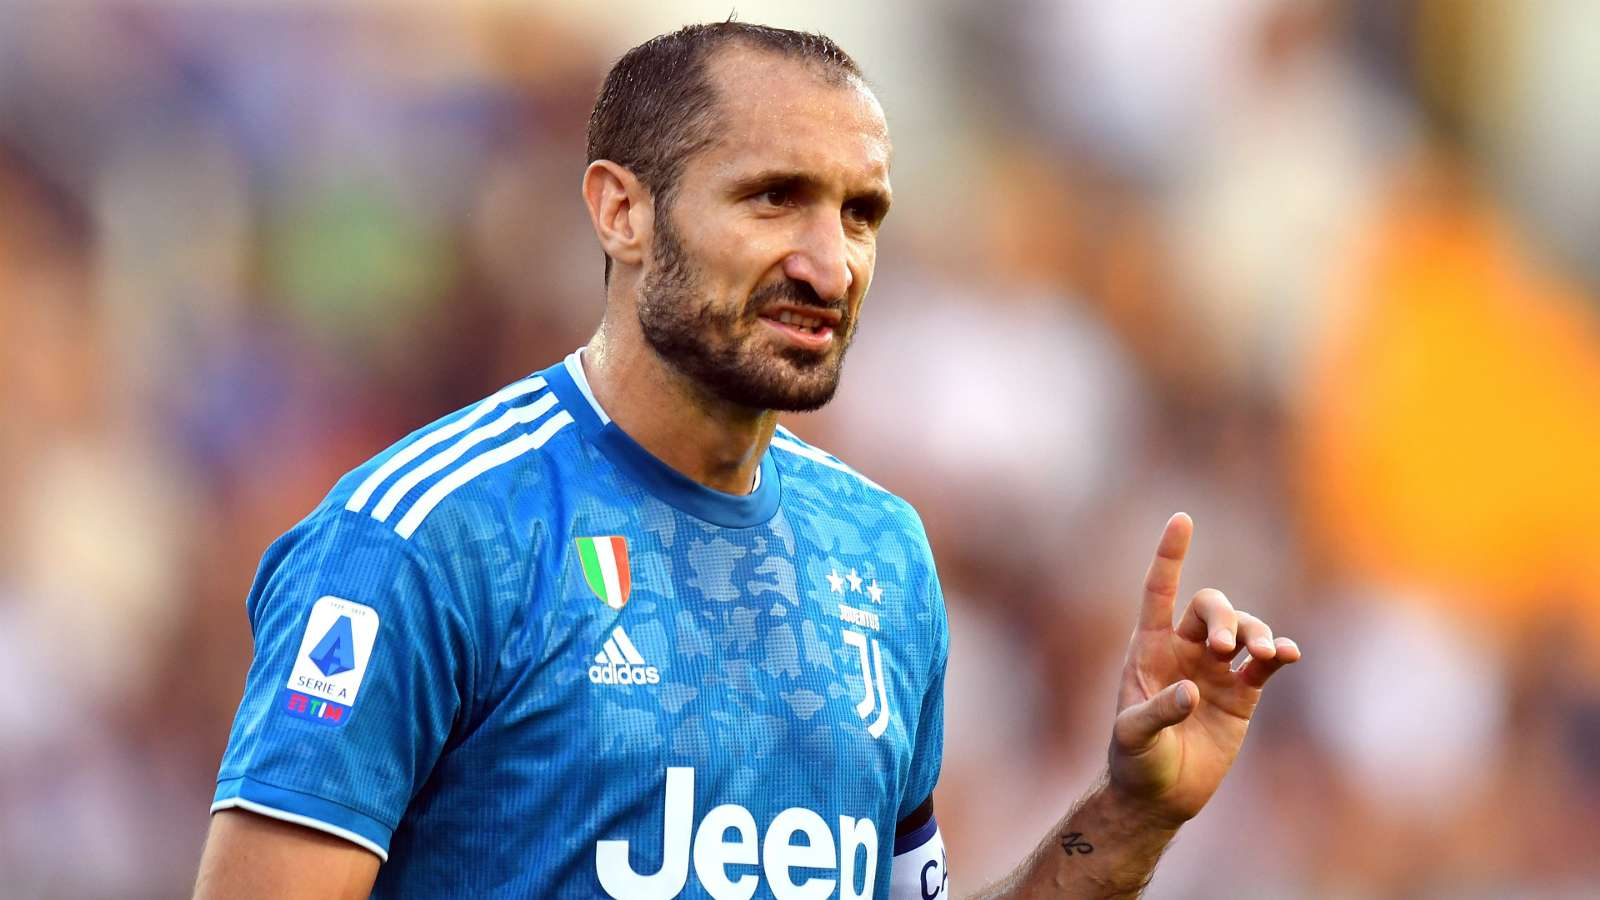 Laporan Pertandingan: Juventus vs Parma